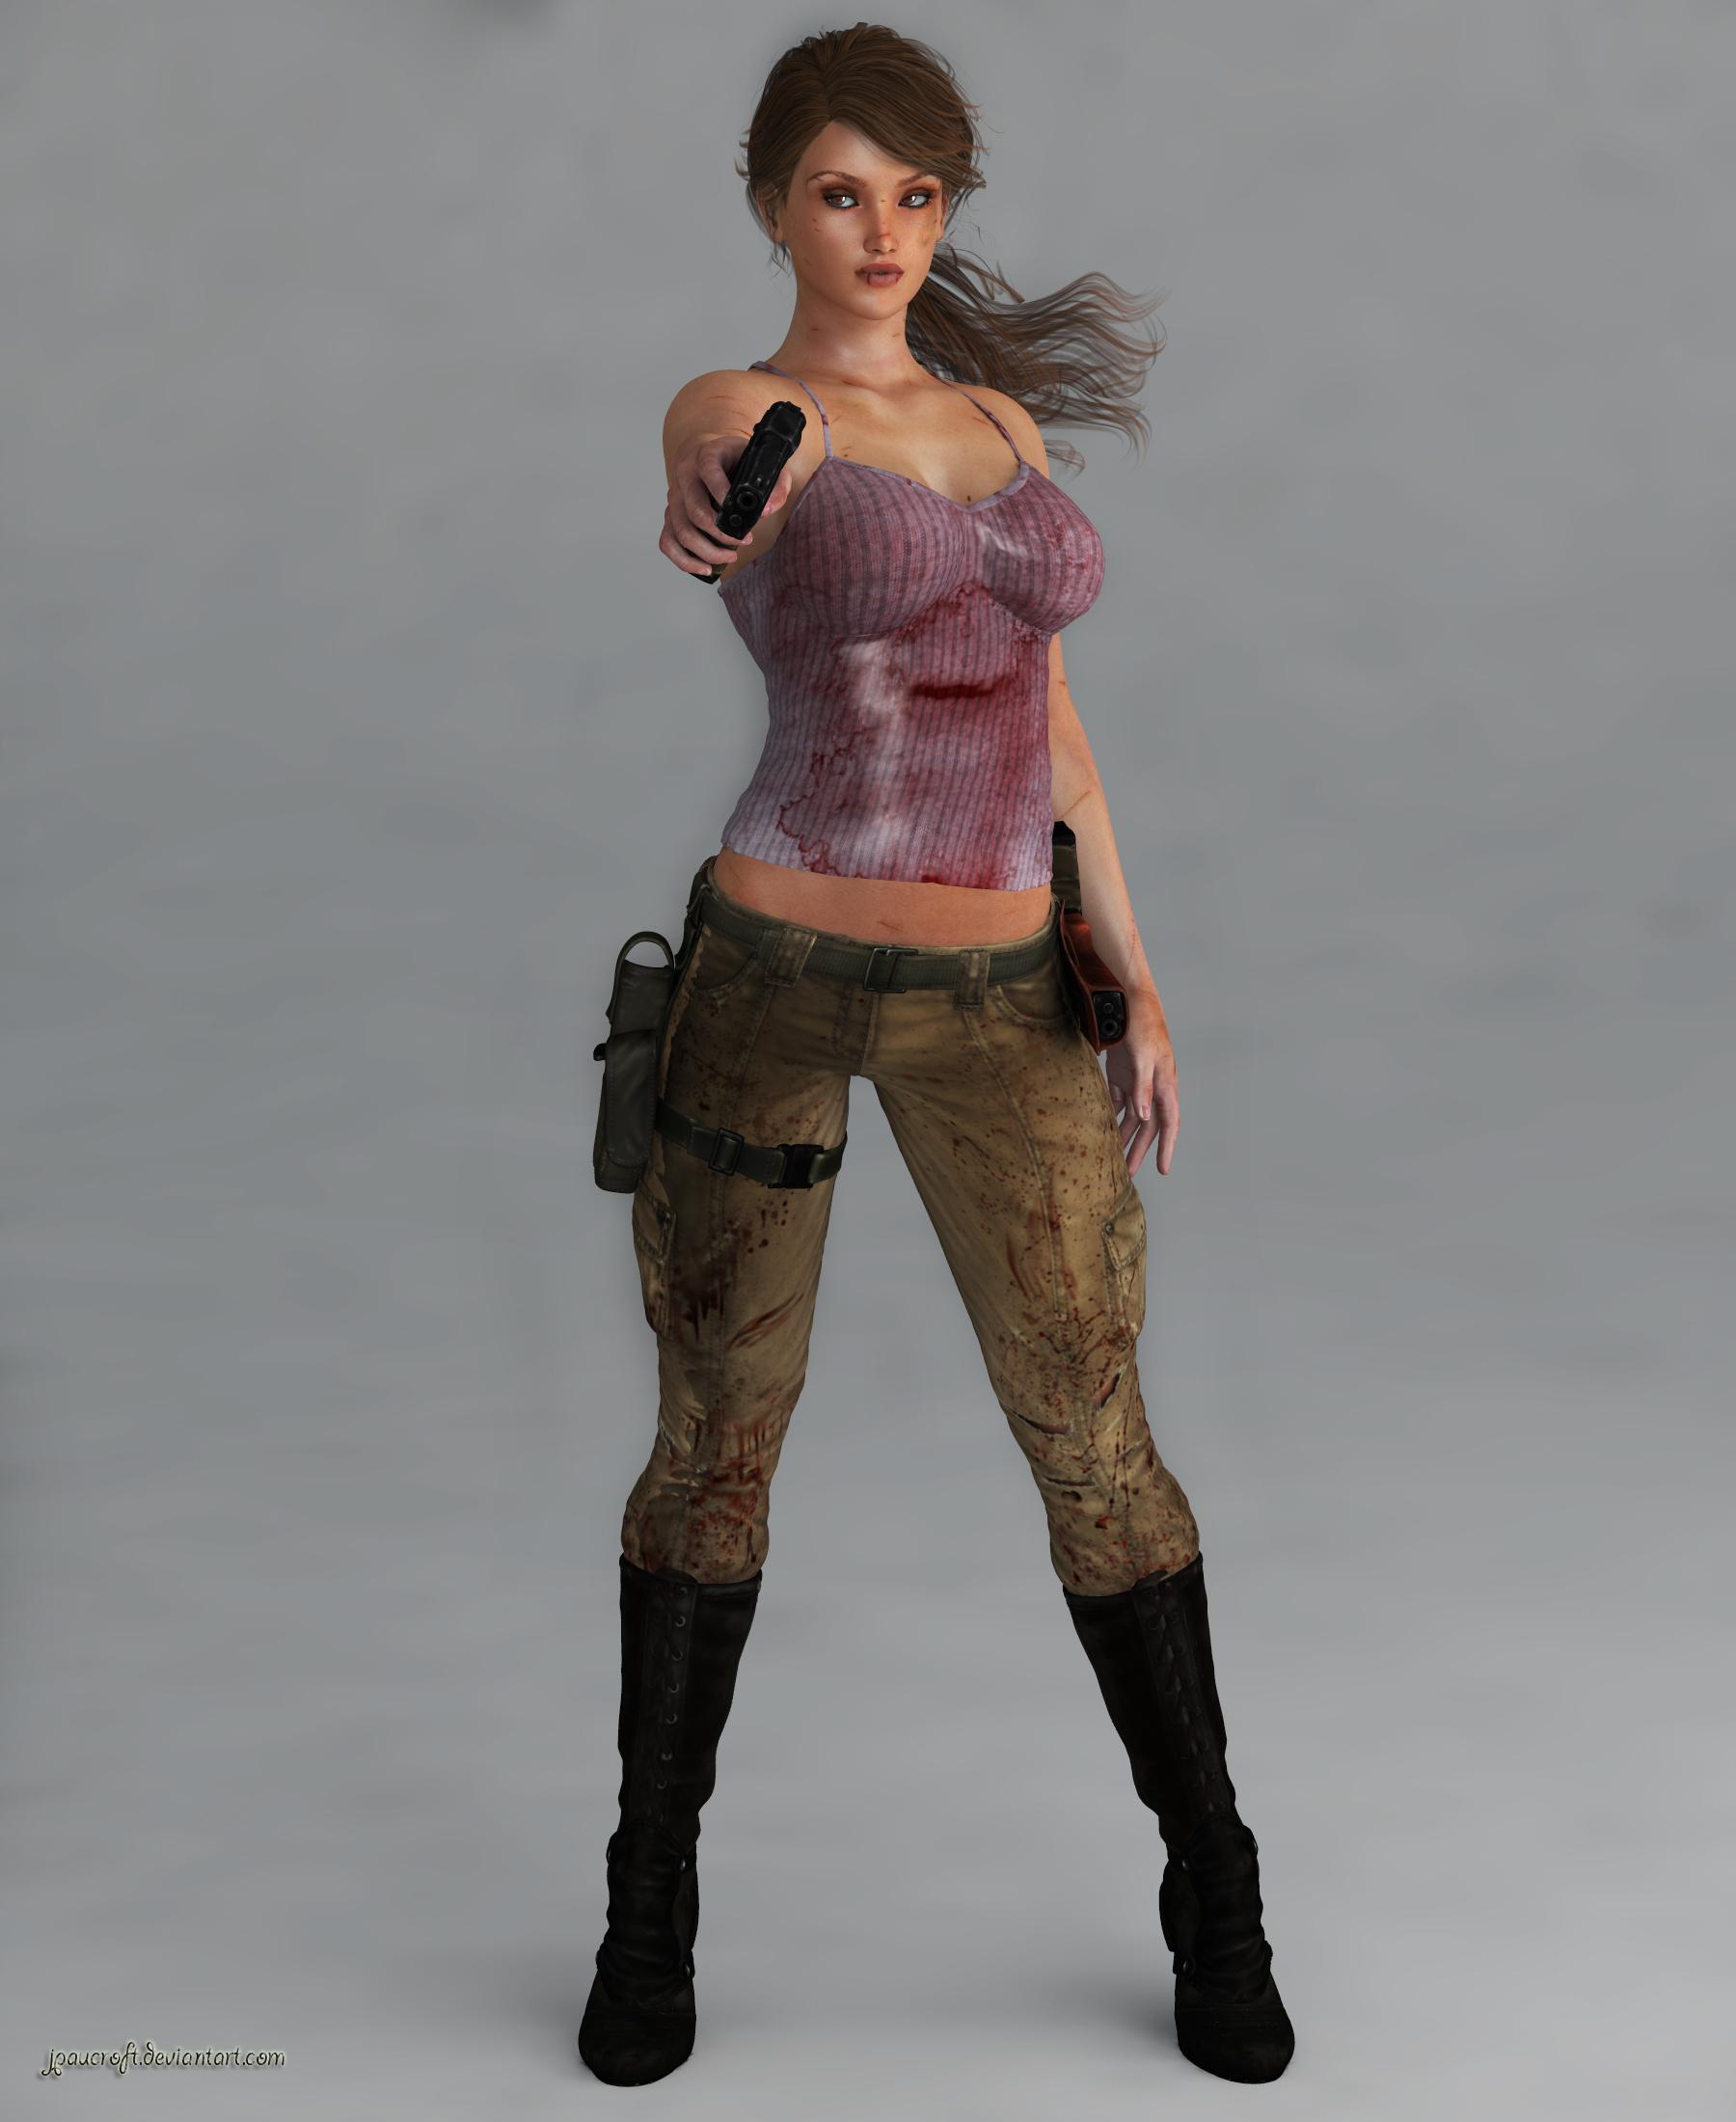 Lara Croft 2013 by JpauCroft